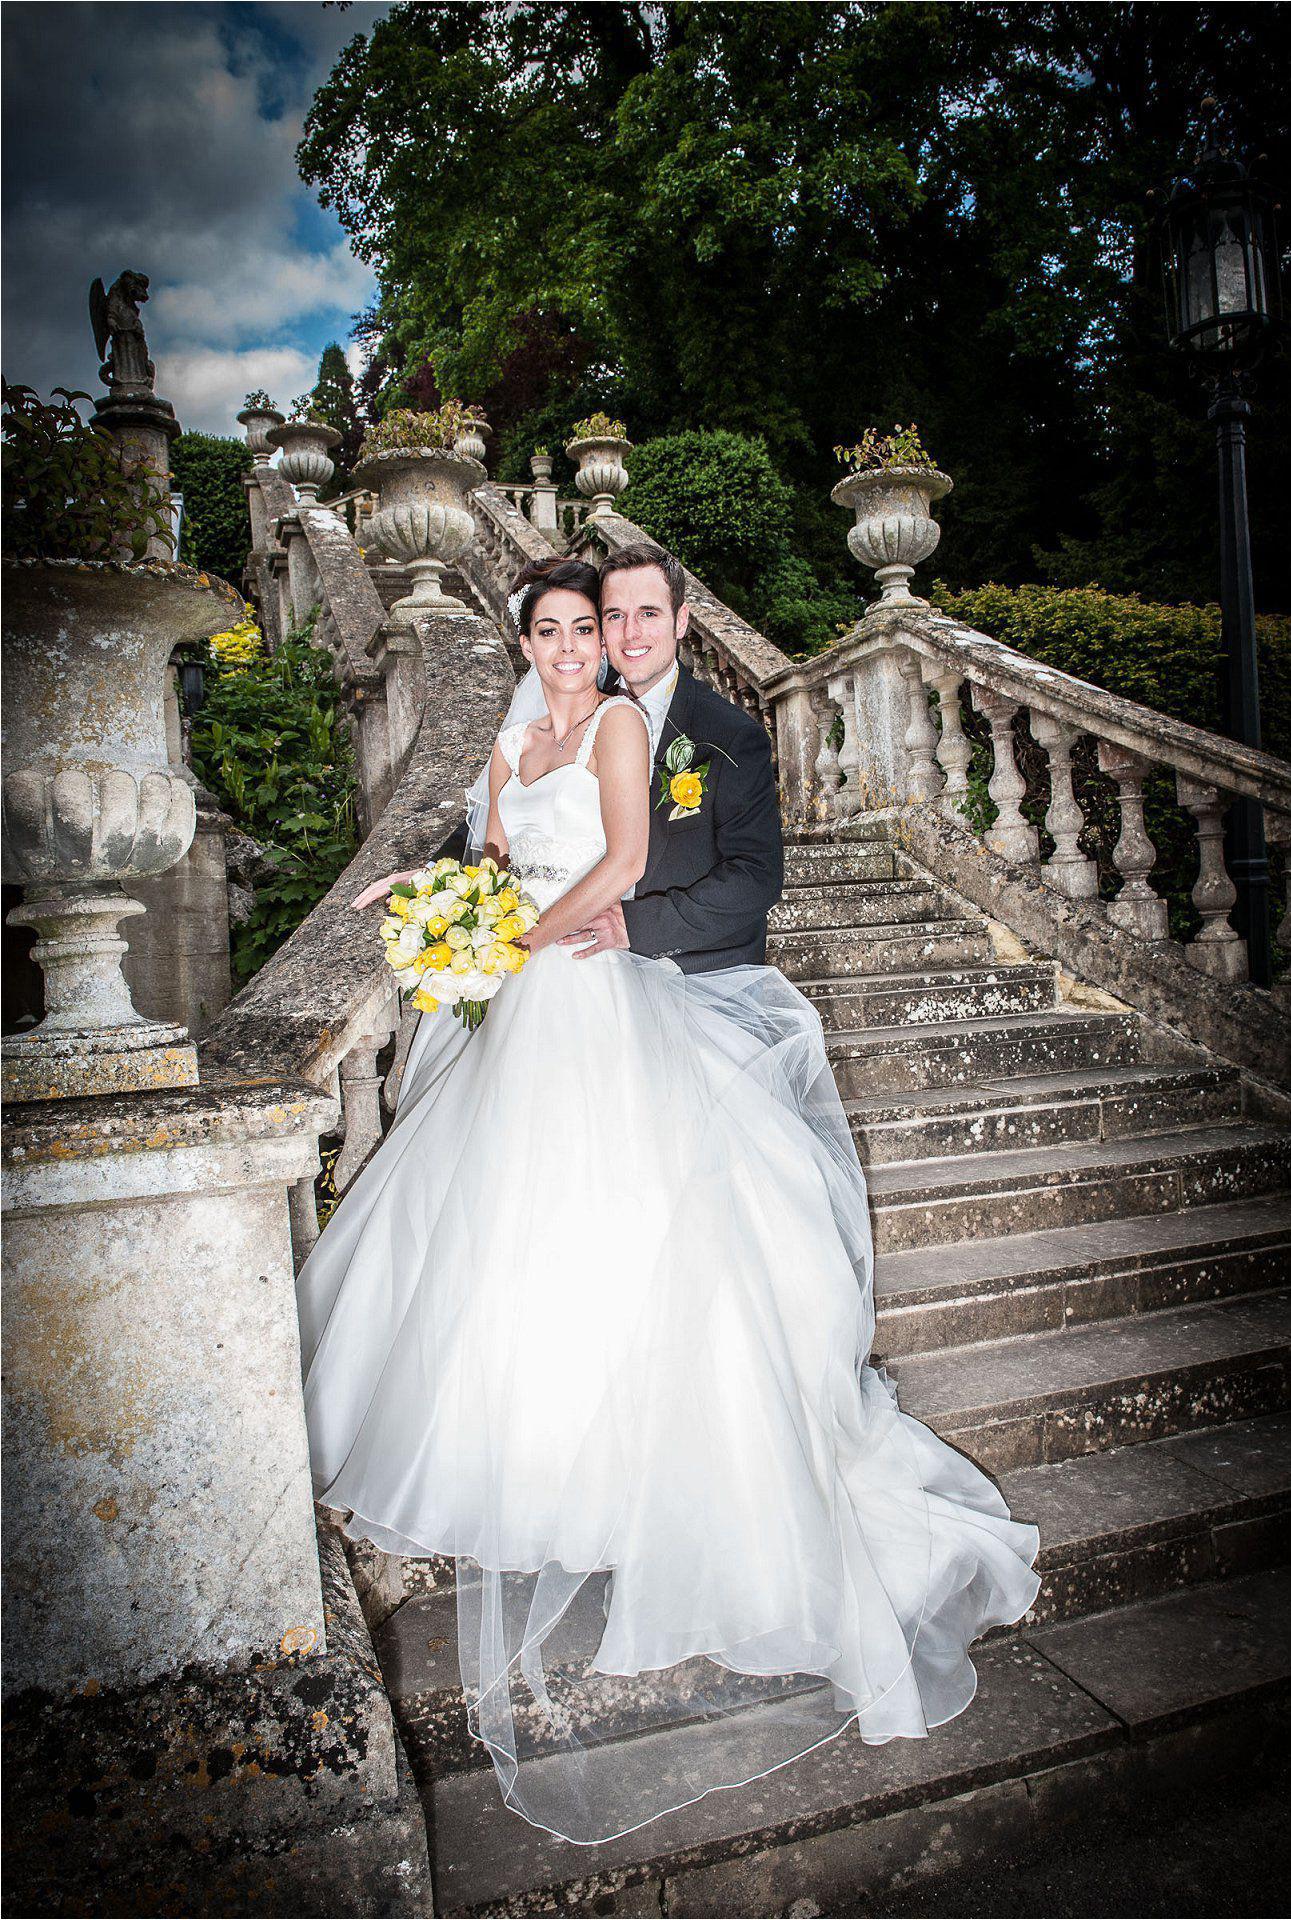 Digital Photography Wedding: Digital Wedding Photography